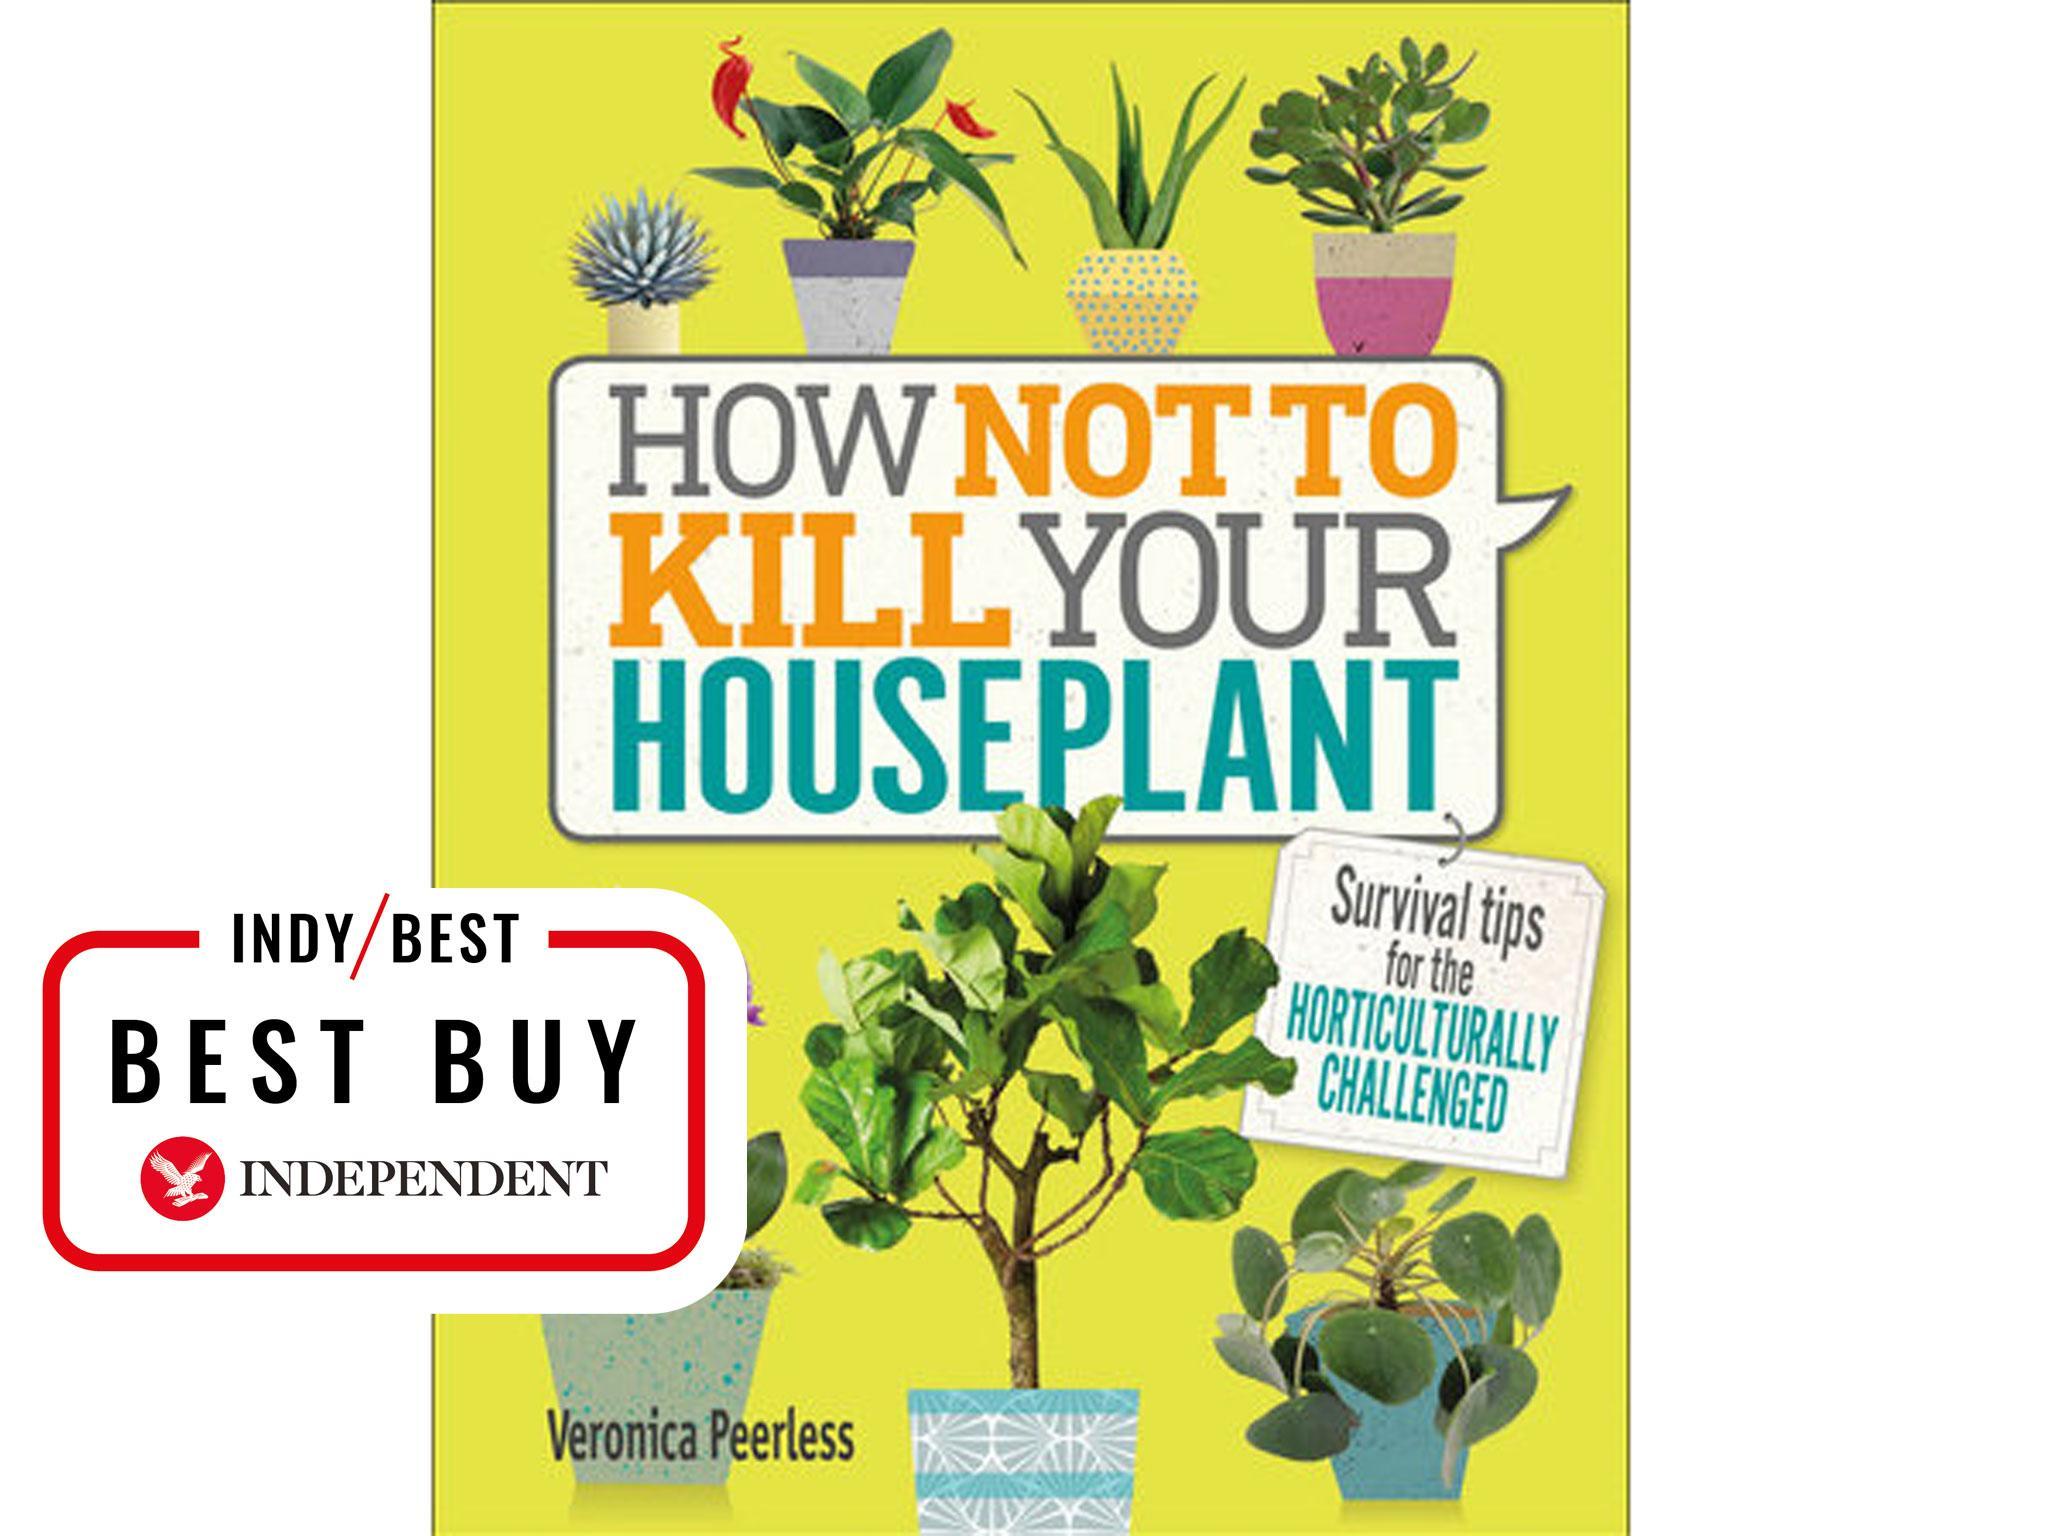 11 best indoor planting books   The Independent